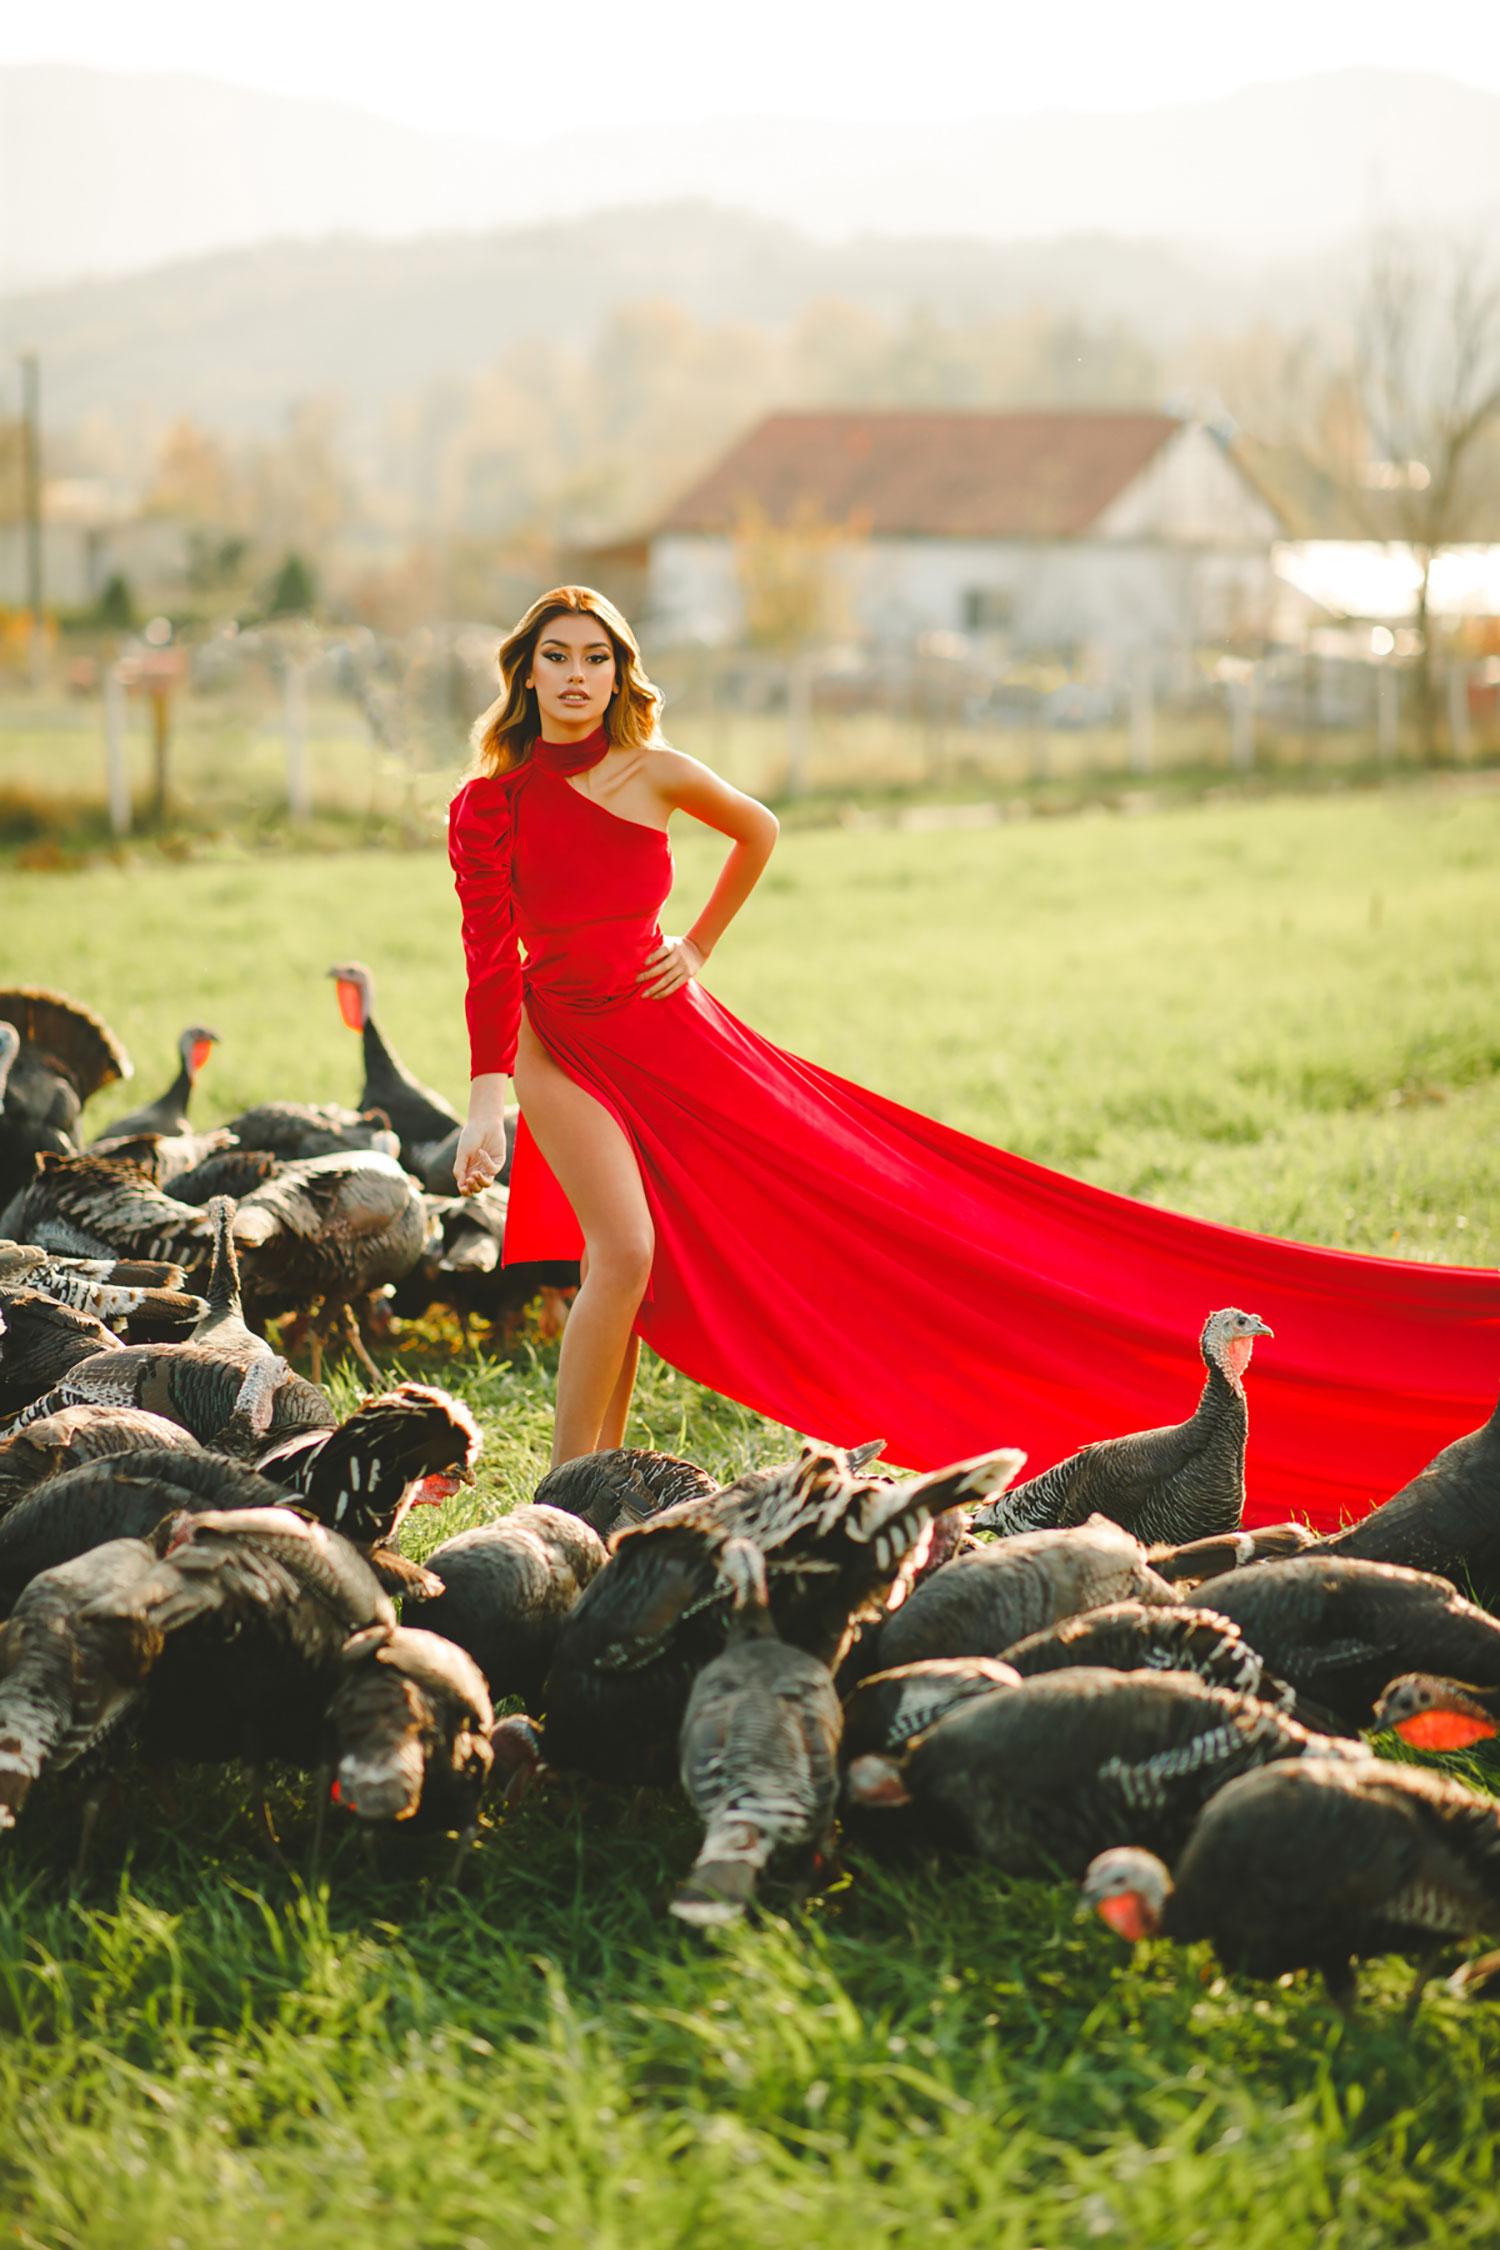 Miss Shqiperia calendar photoshoot in nature